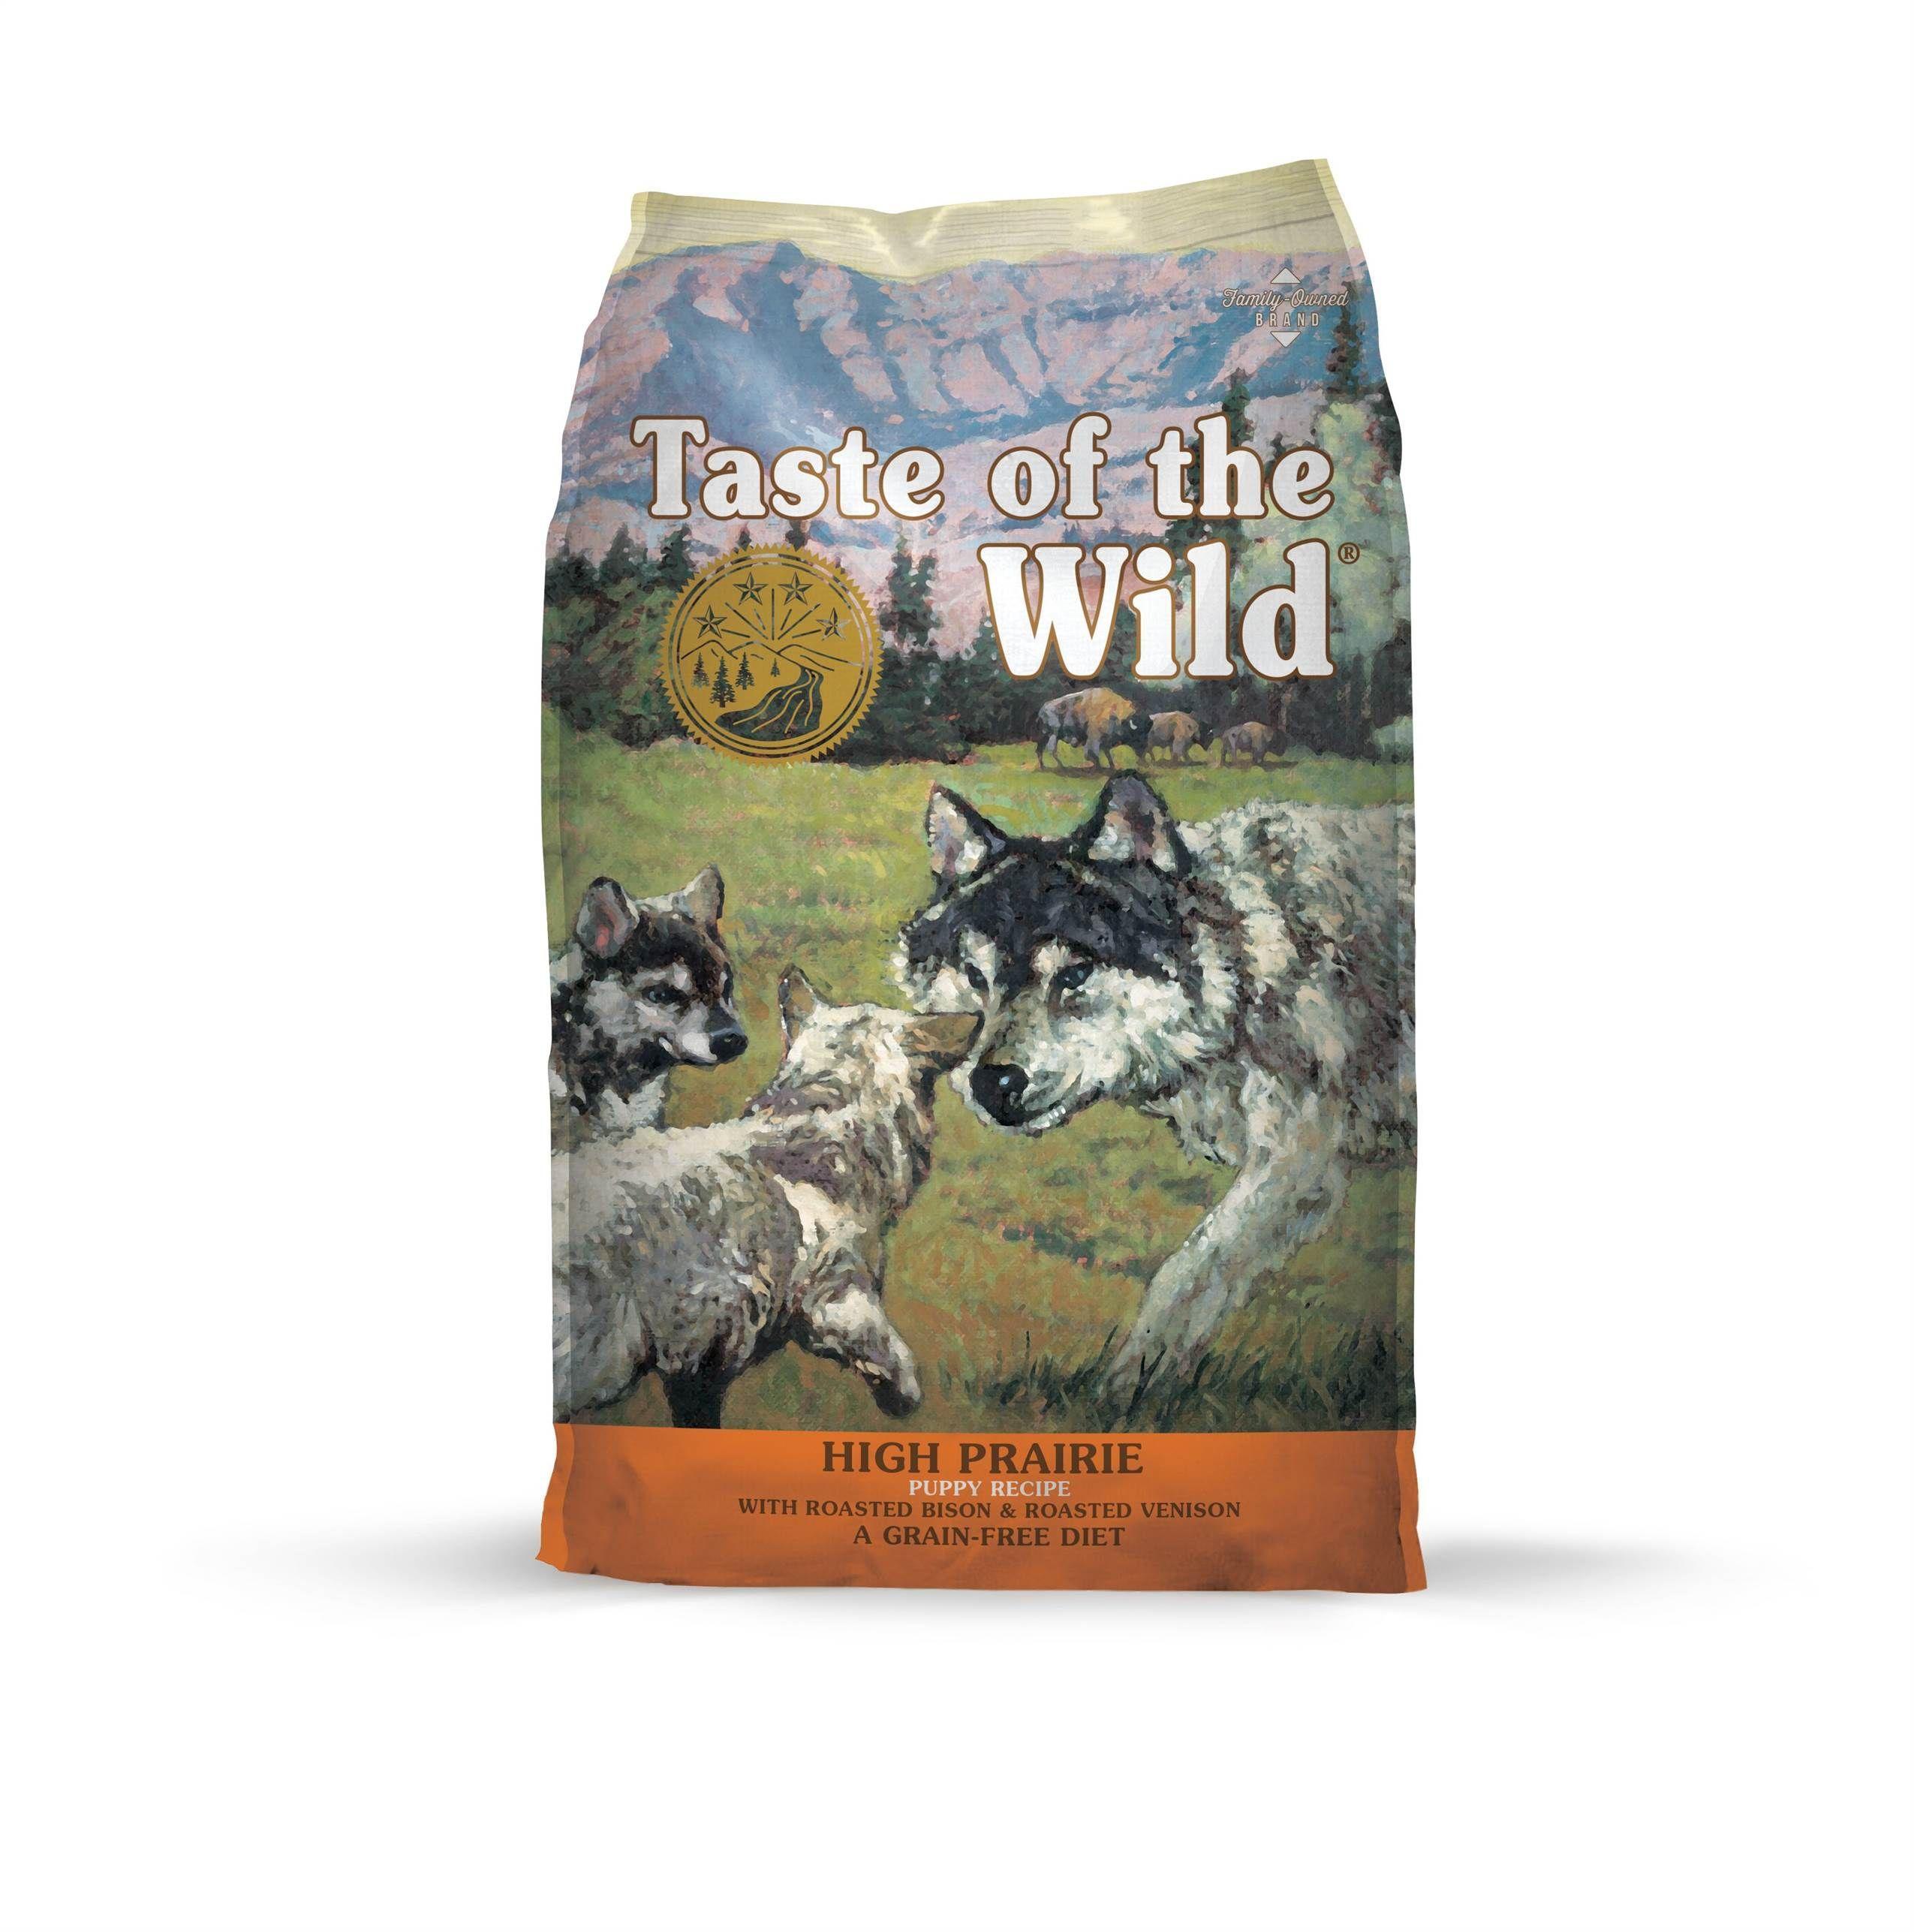 Taste of the Wild High Prairie Puppy Formula Dry Dog Food 5lbs 00014